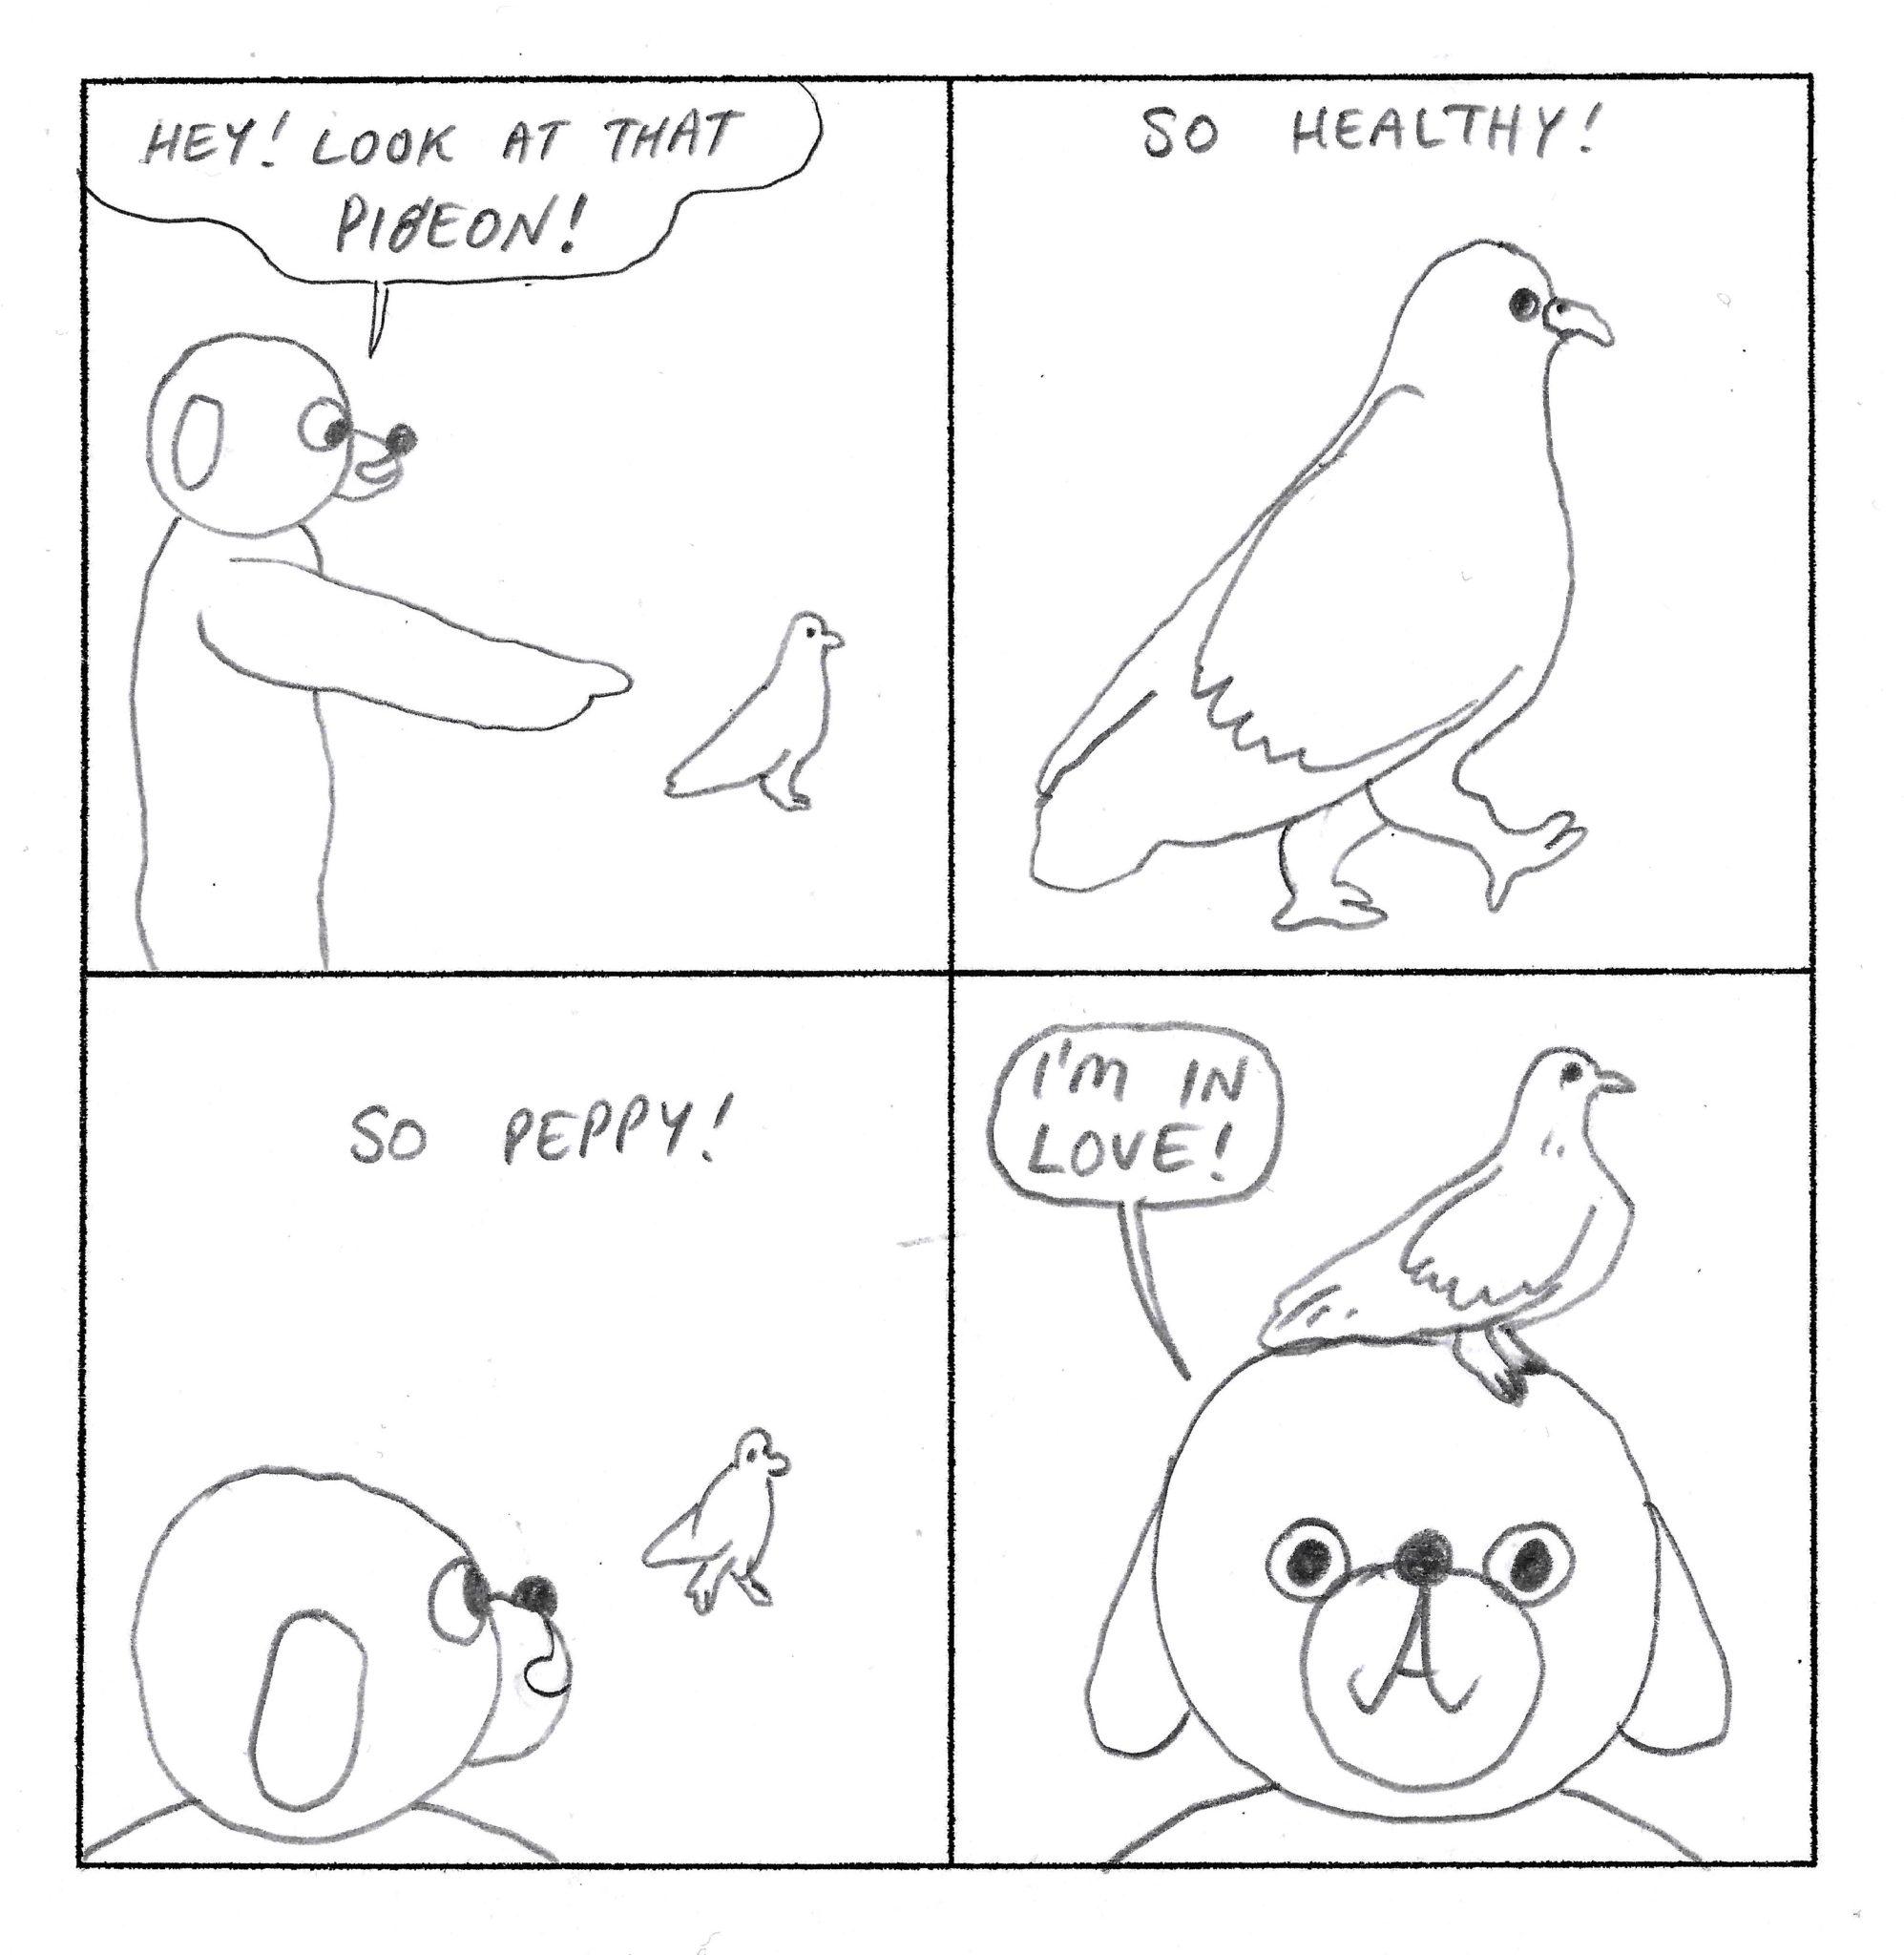 Dog Comics 111-120 - Page 1